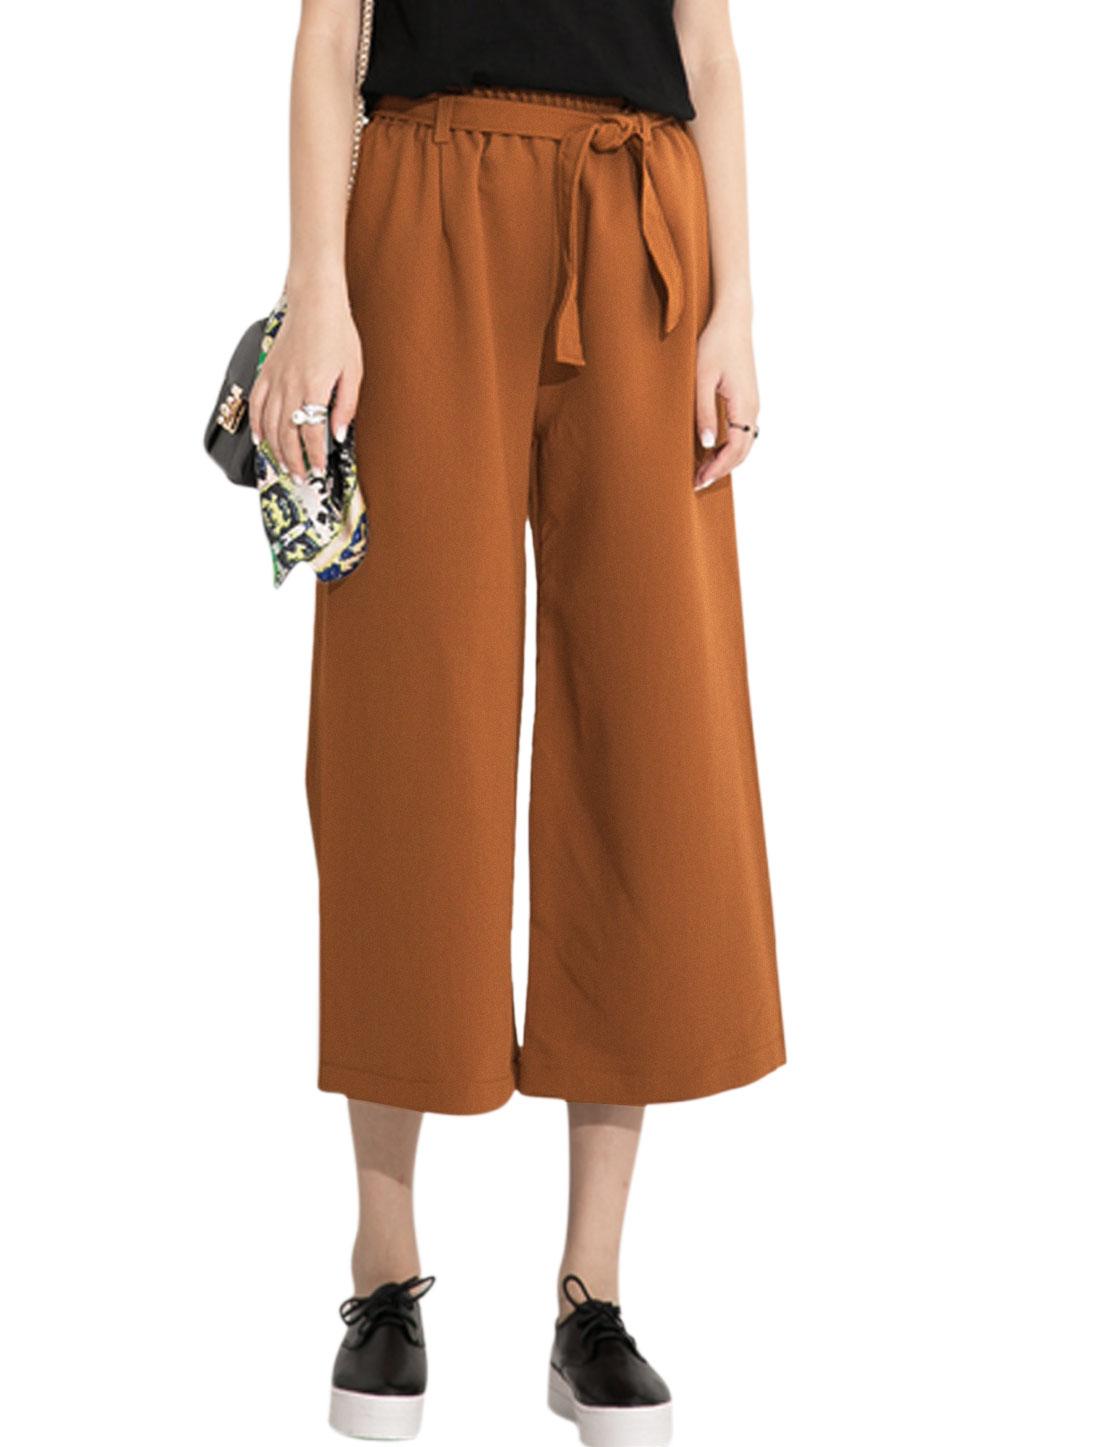 Women Elastic Waist Cropped Slanted Pockets Wide Leg Pants Rust XS